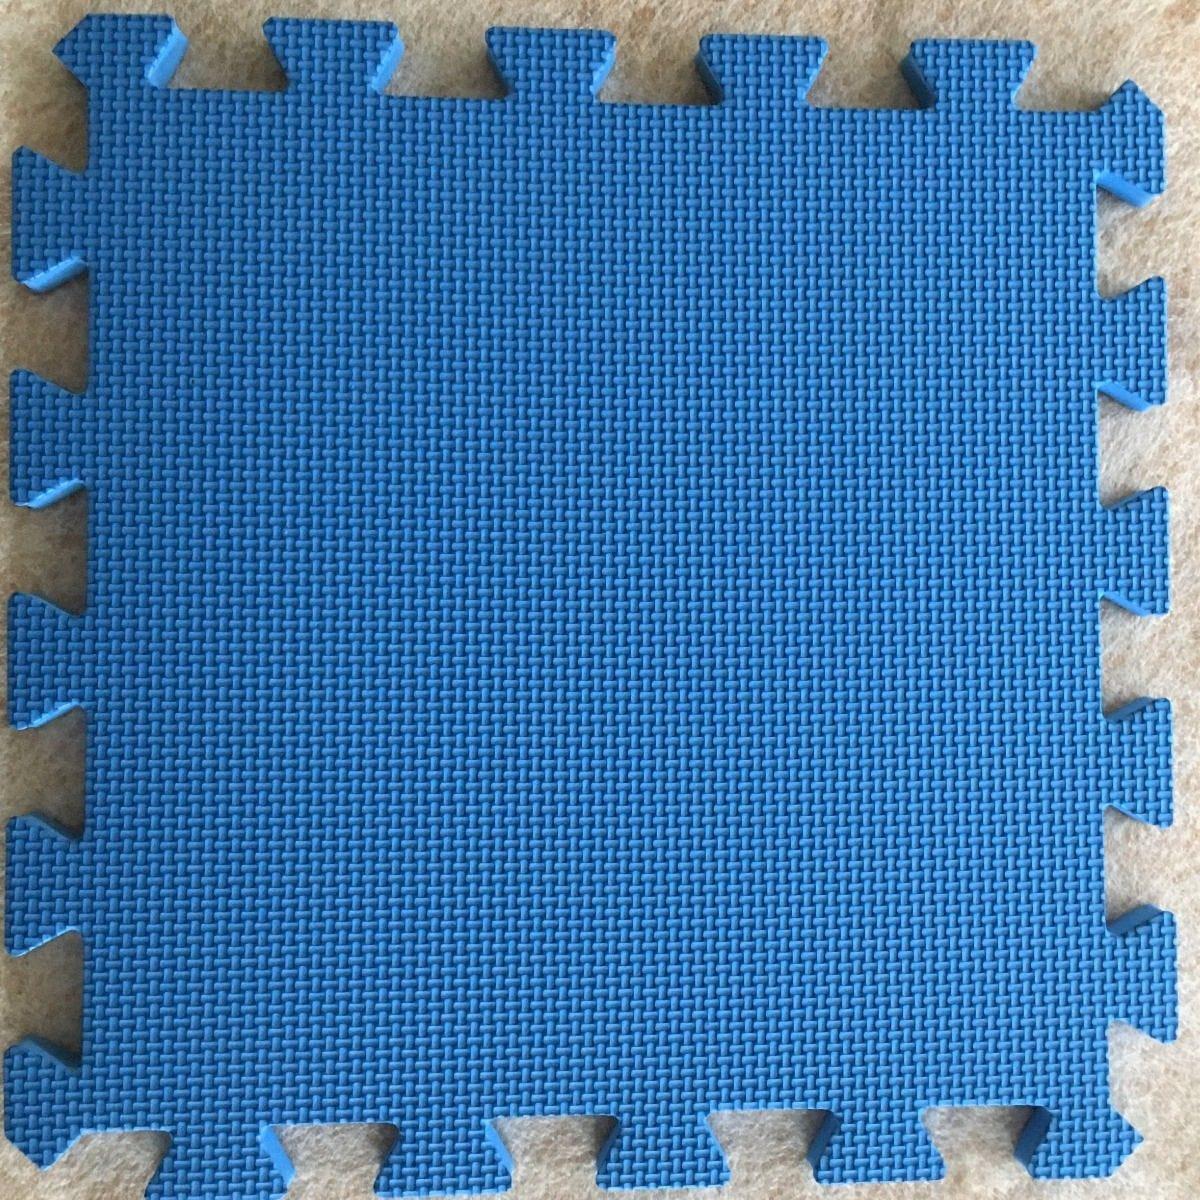 Warm Floor Playhouse Tiling Kit - Blue